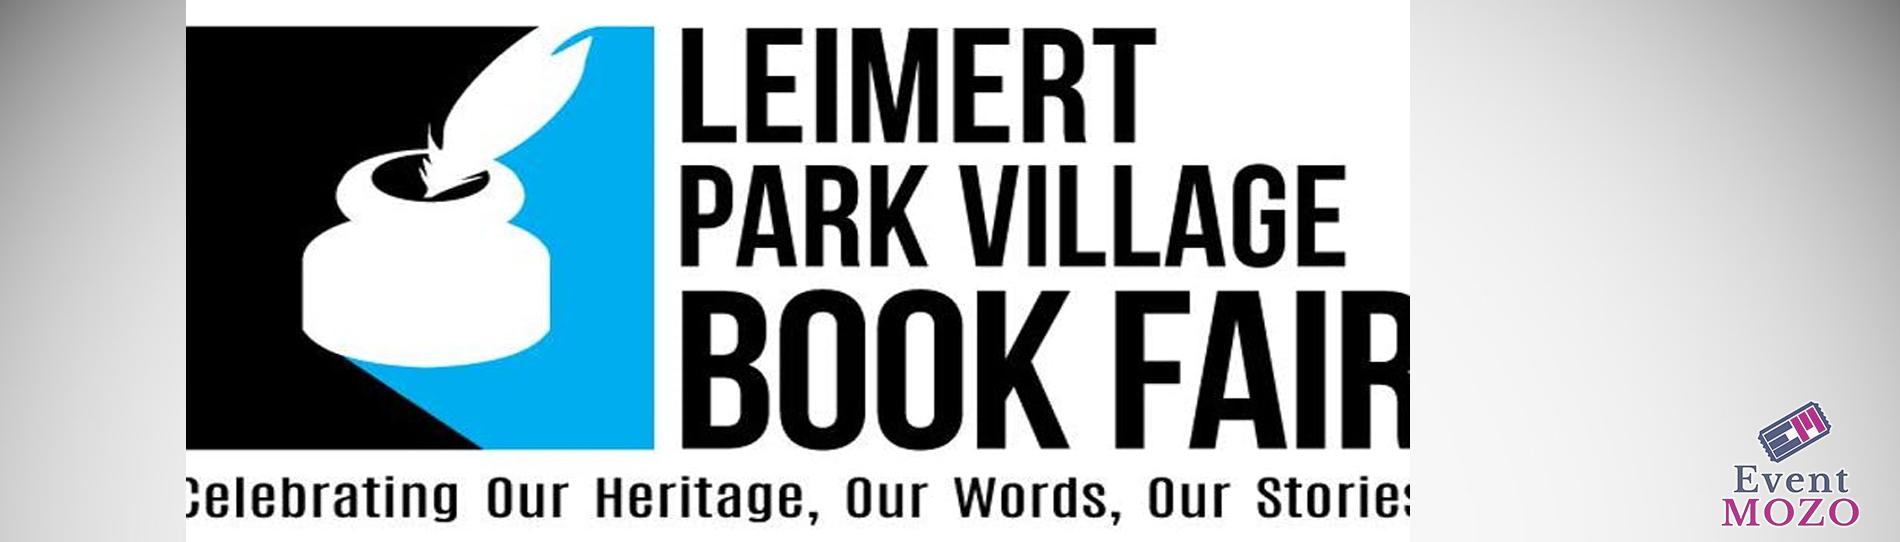 EventMozo Leimert Park Village Book Fair